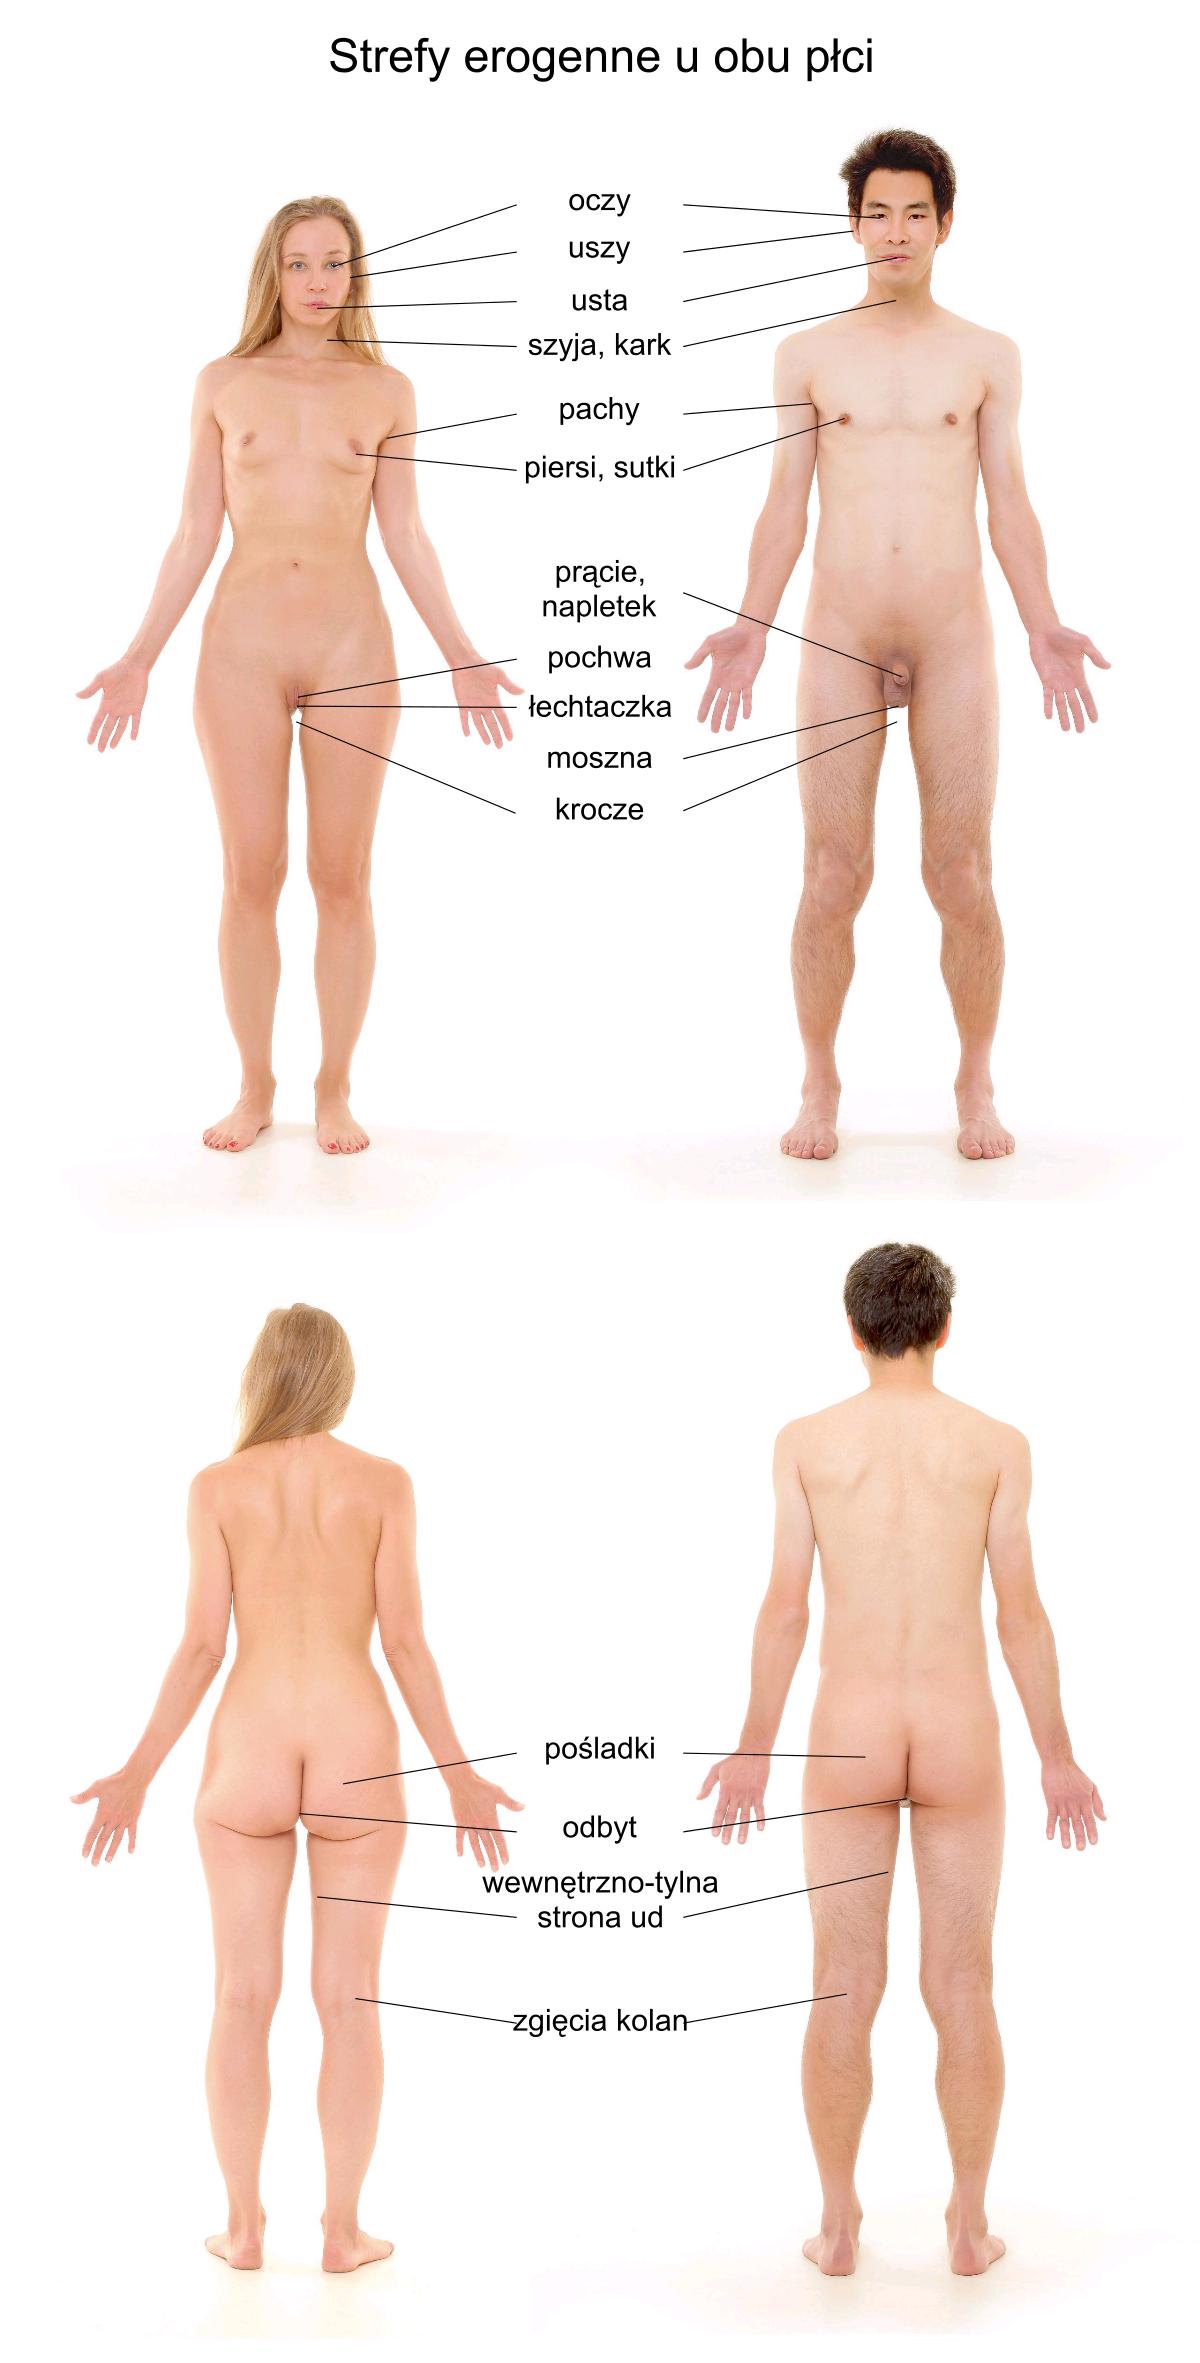 mapa stref erogennych